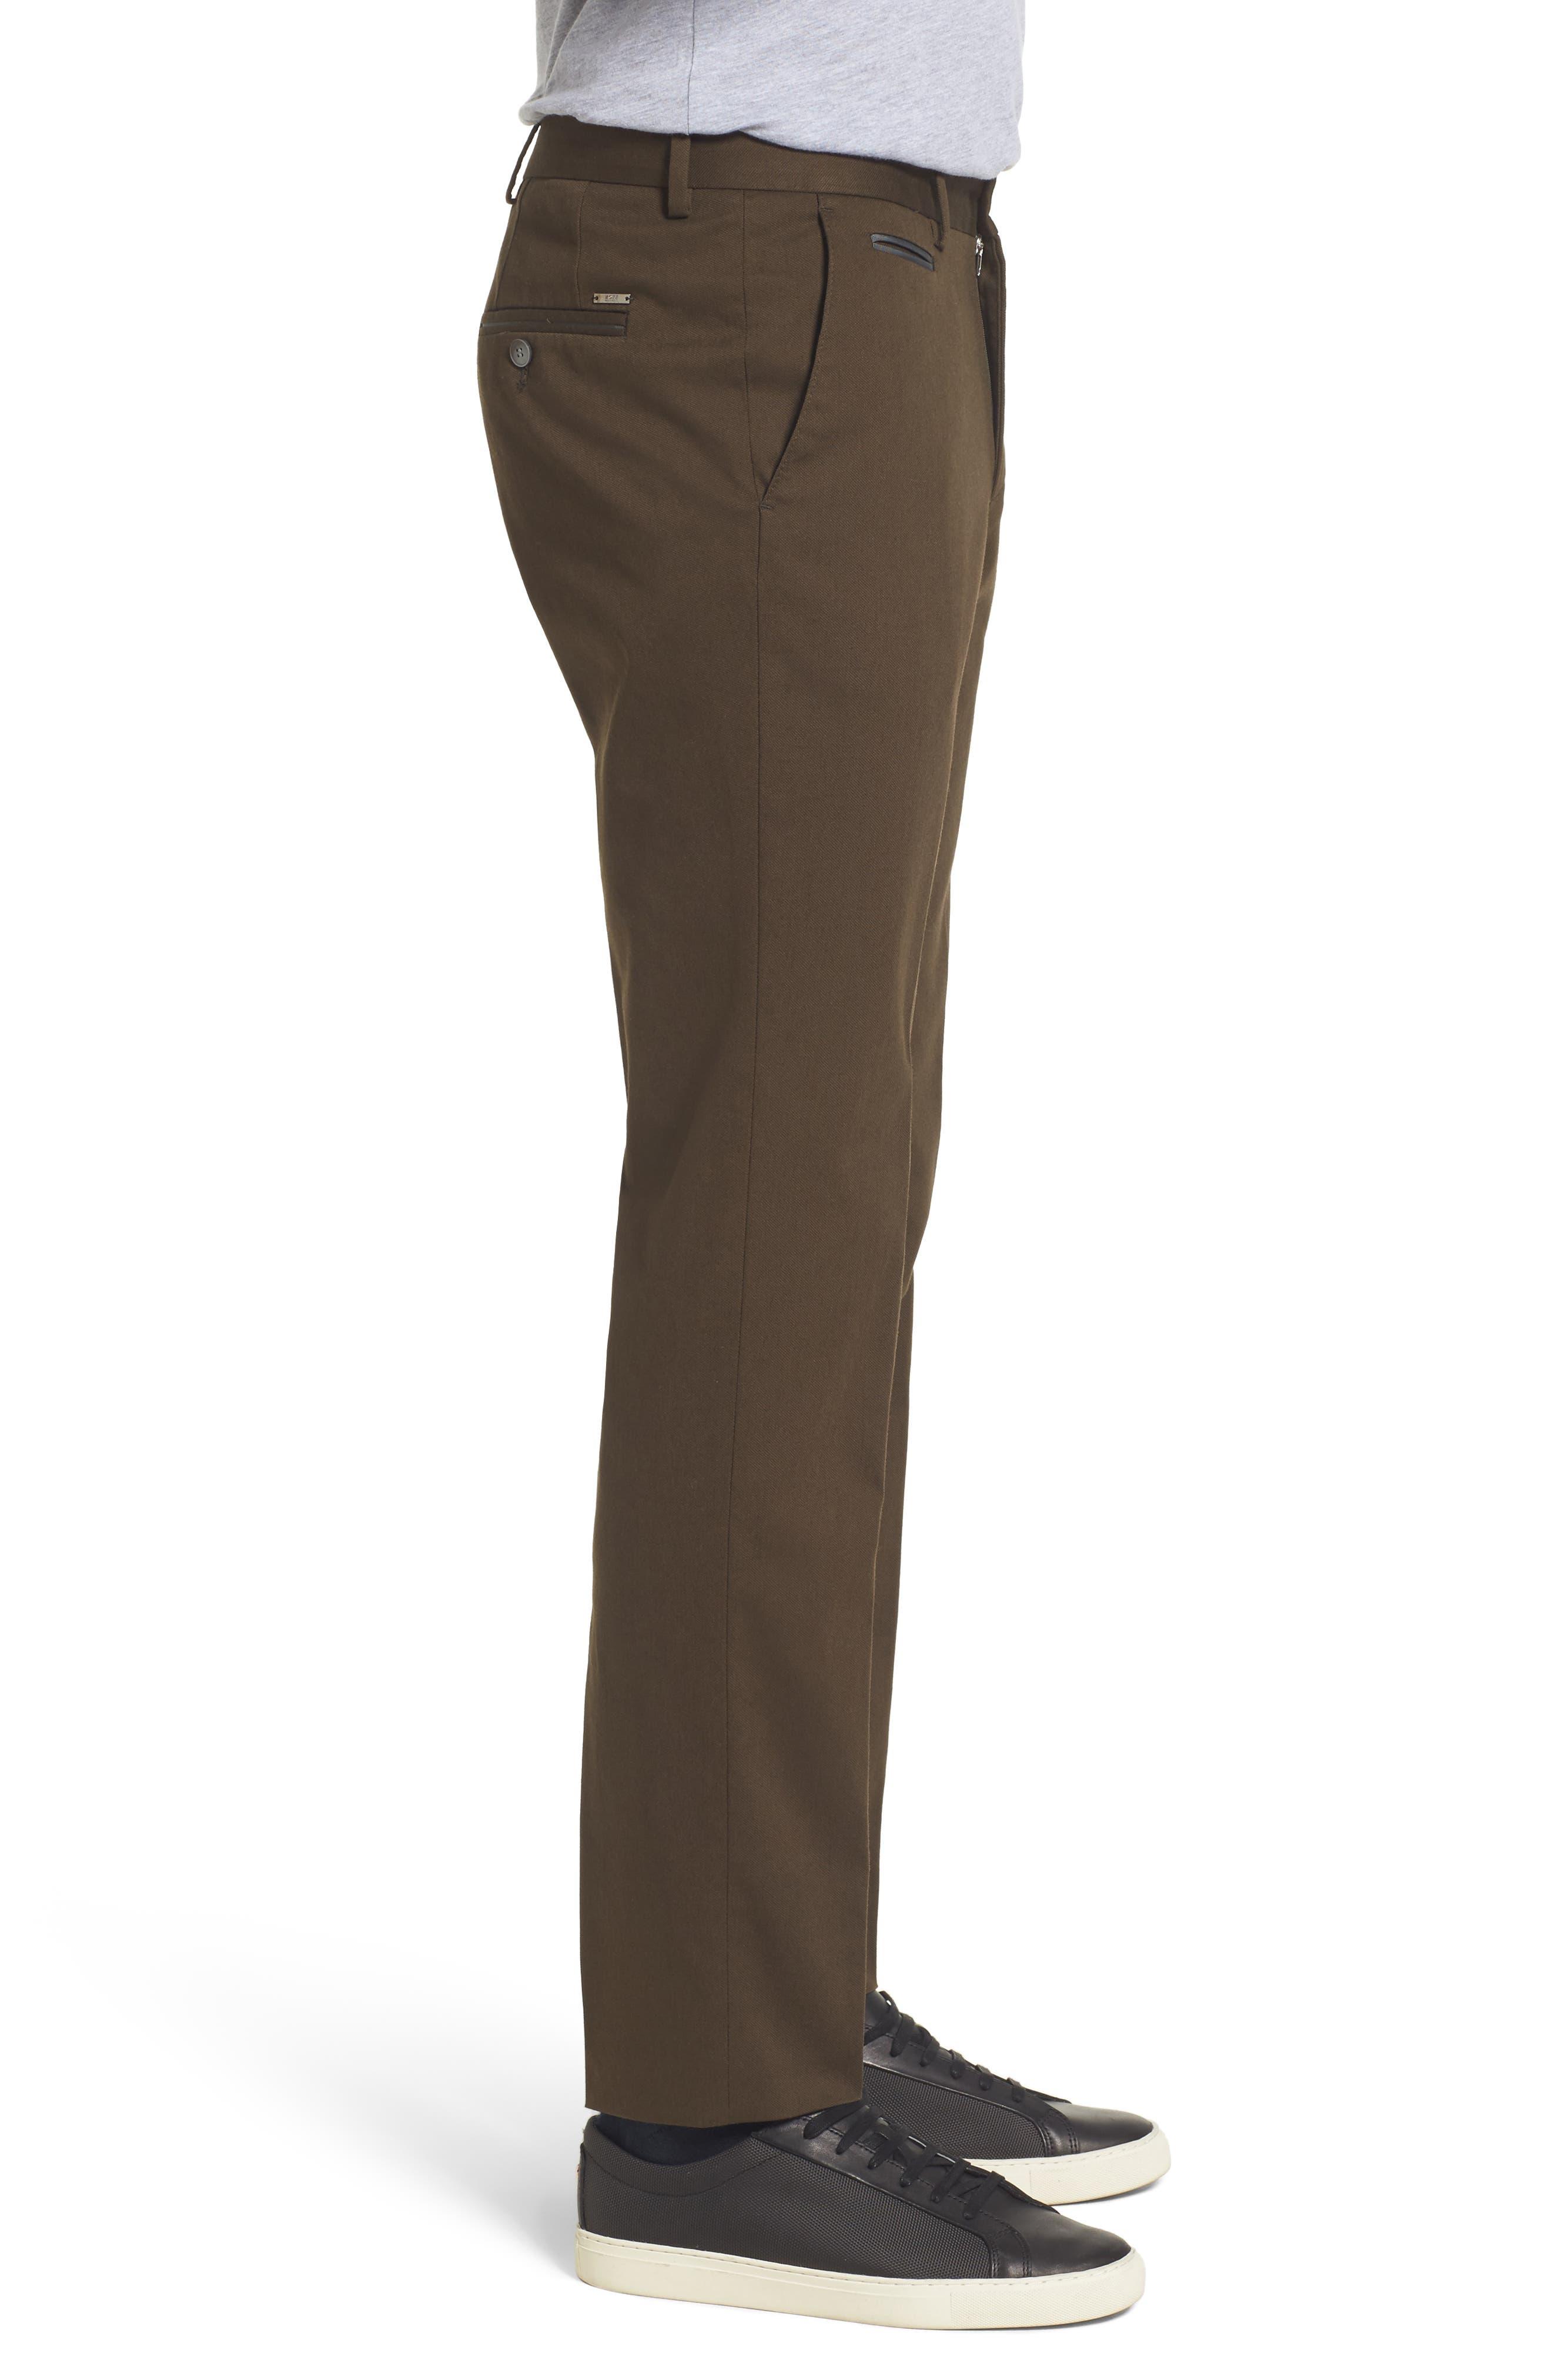 Batho-W Regular Fit Trousers,                             Alternate thumbnail 3, color,                             Open Green